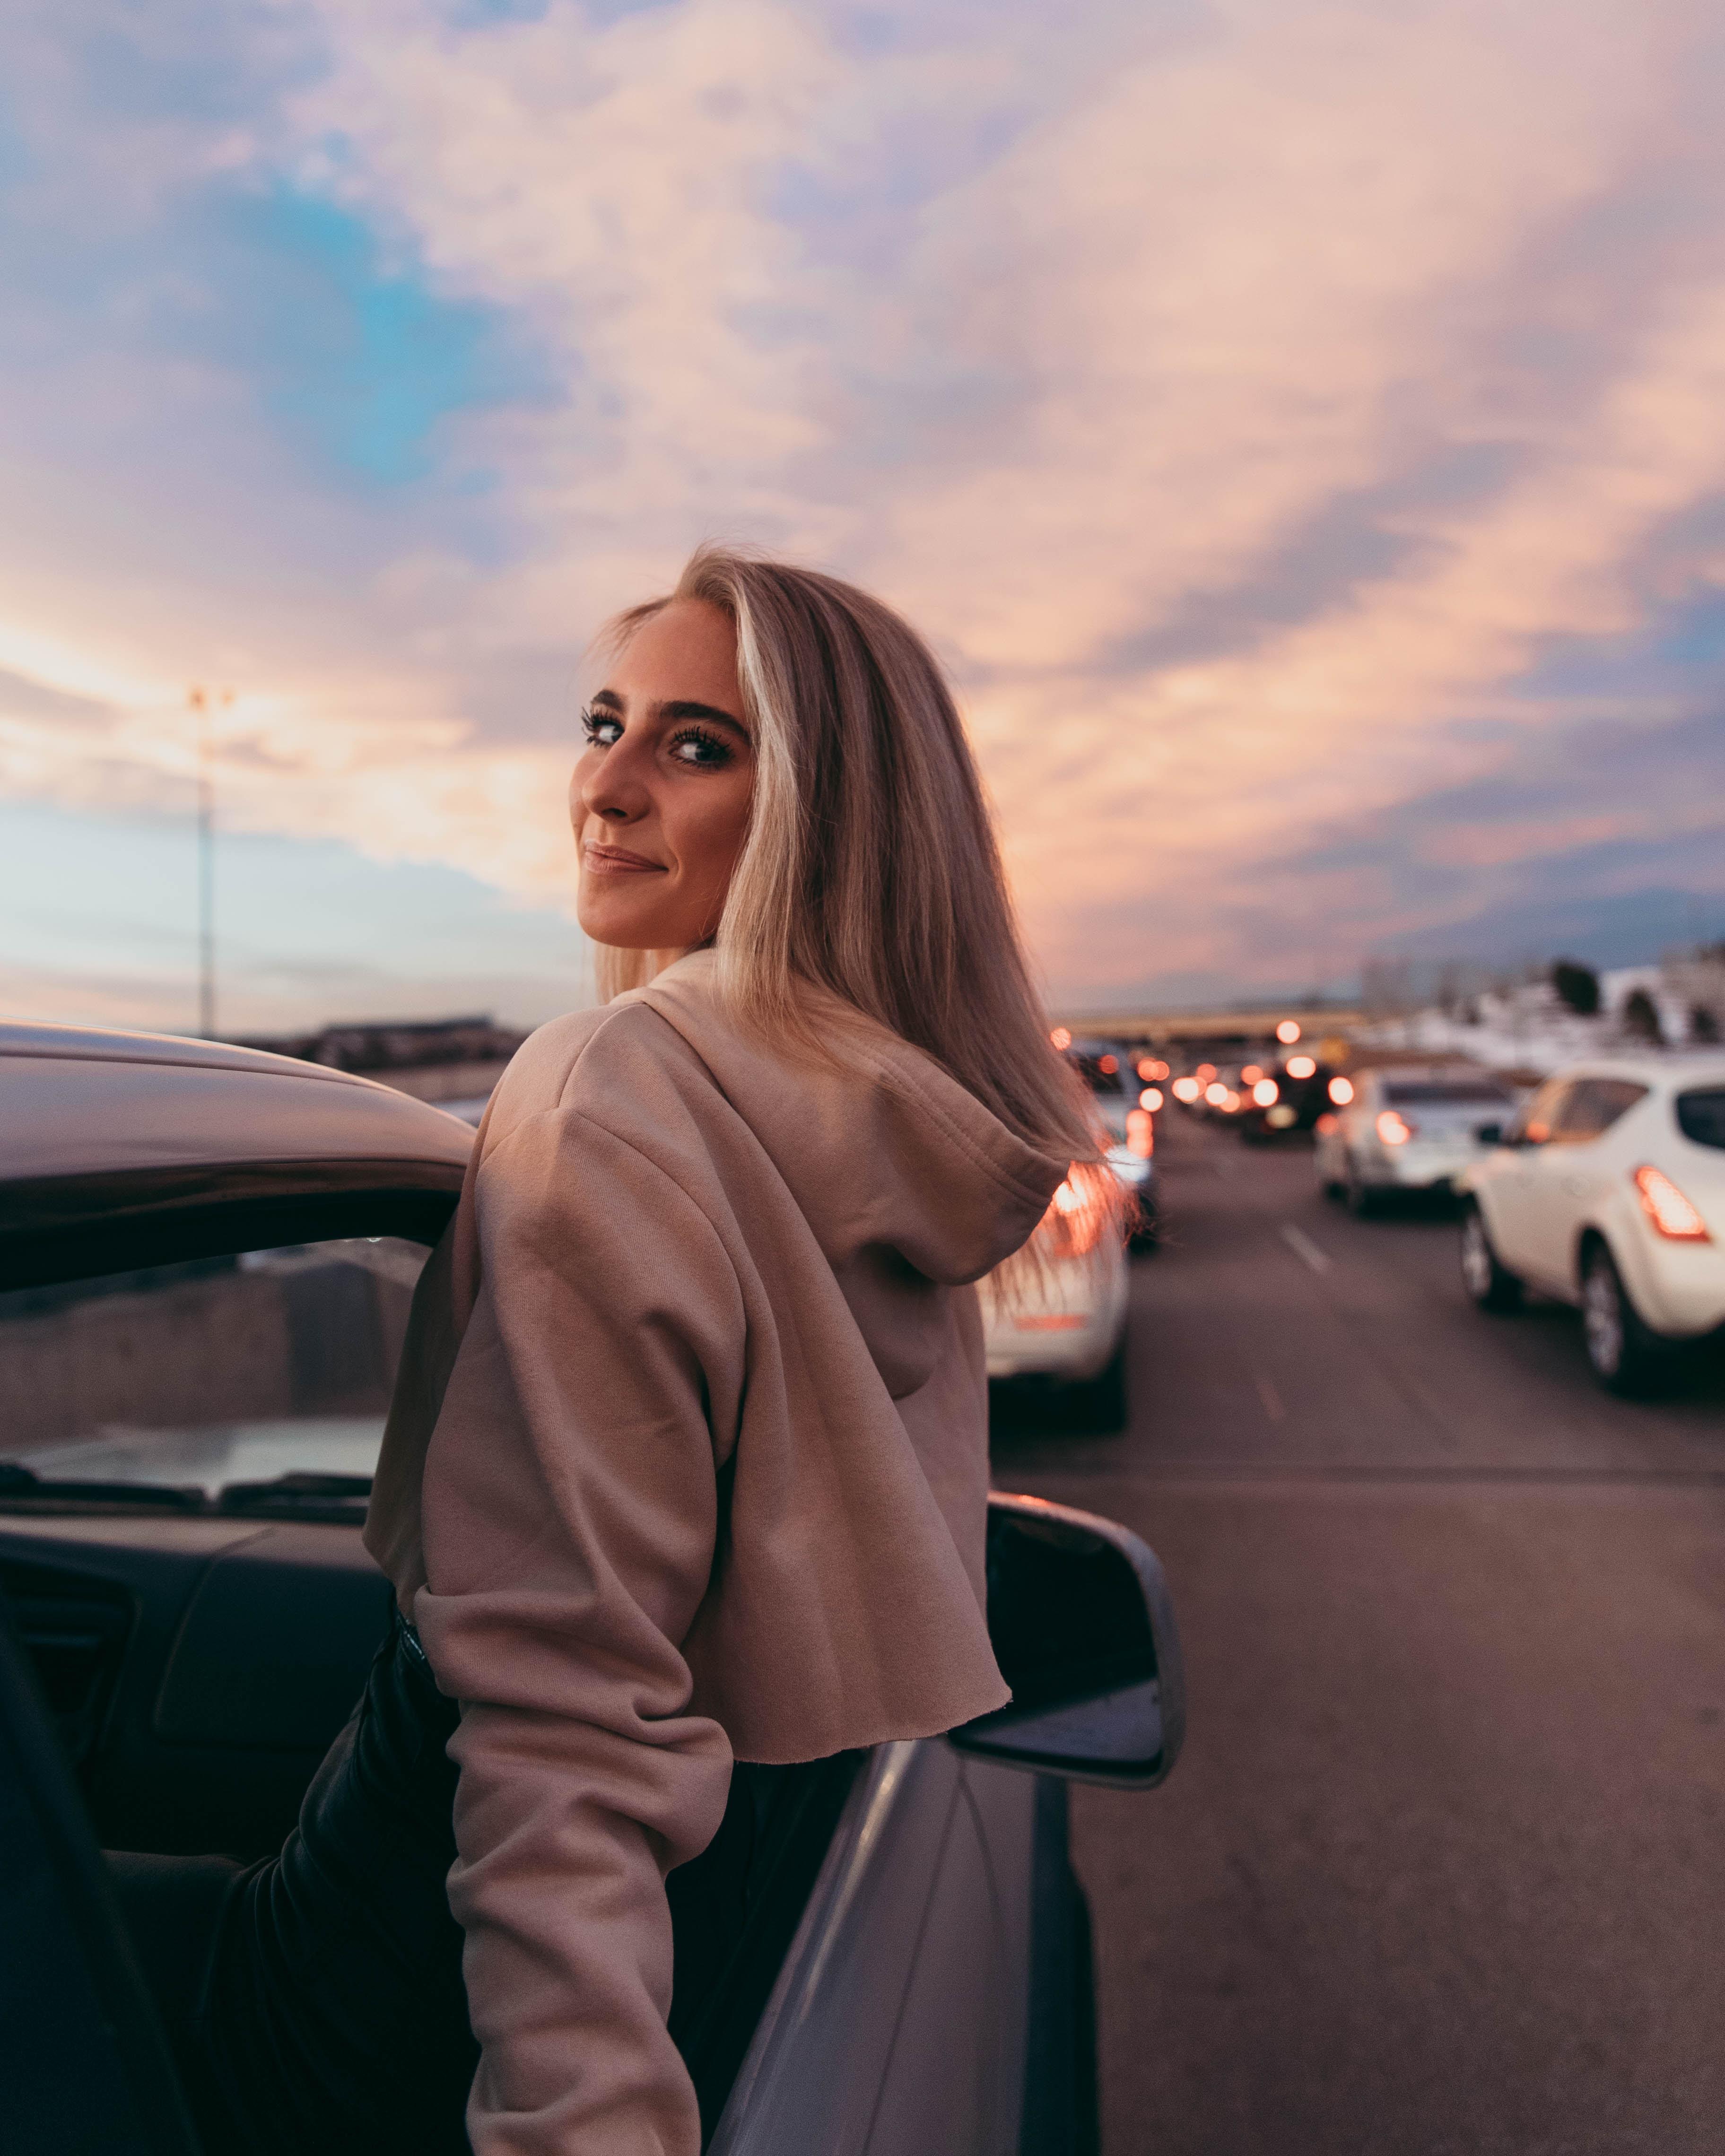 woman wearing beige pullover hoodie inside car during daytime